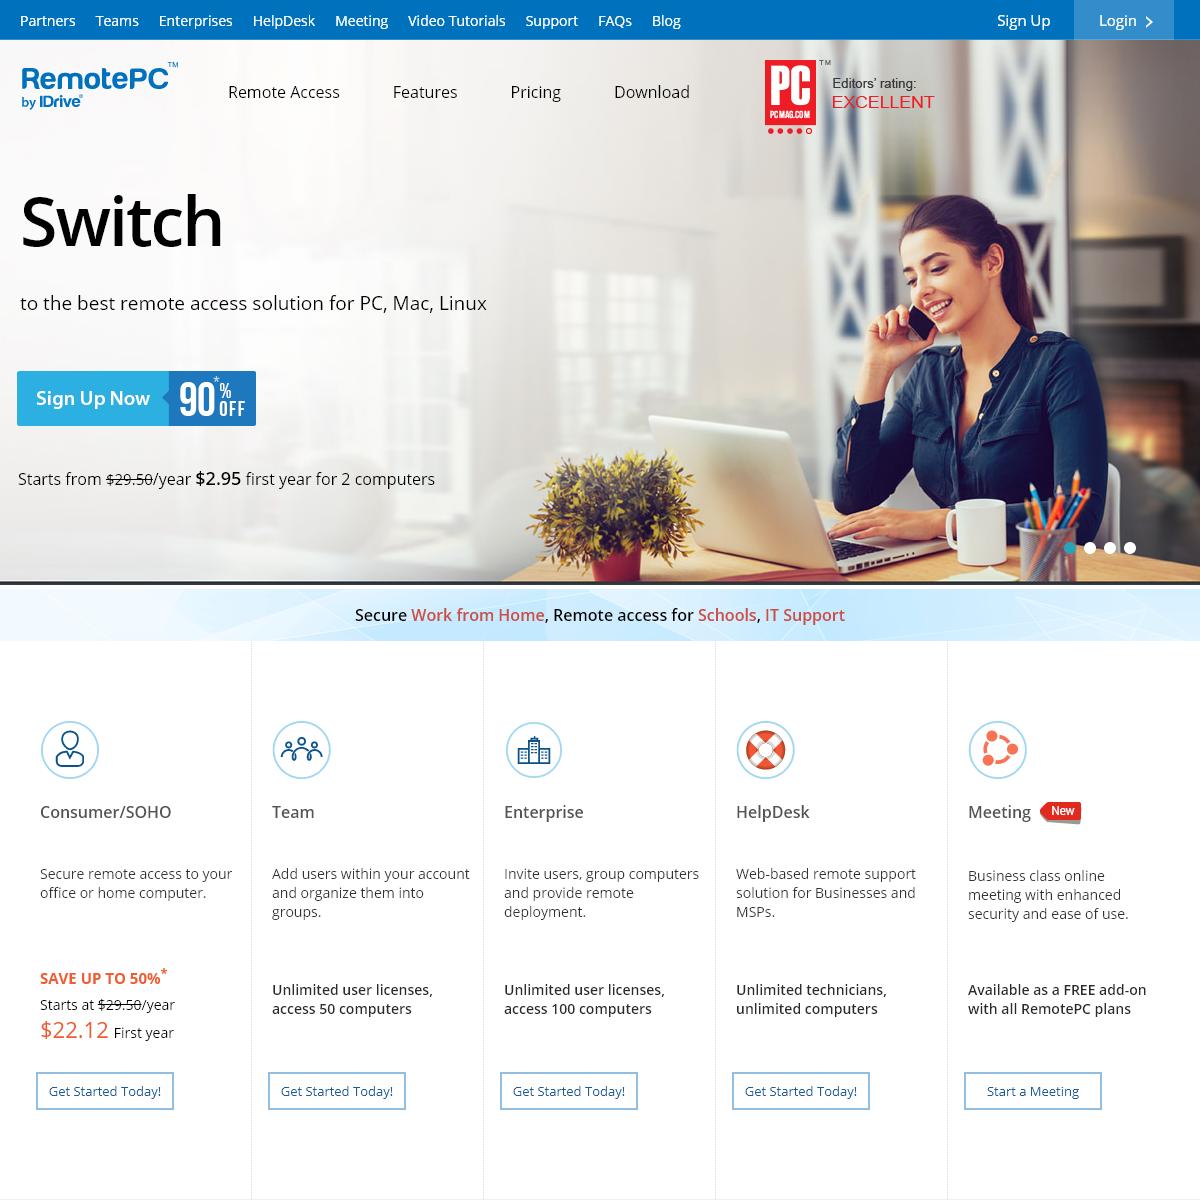 Remote Access and Remote Desktop - RemotePC®